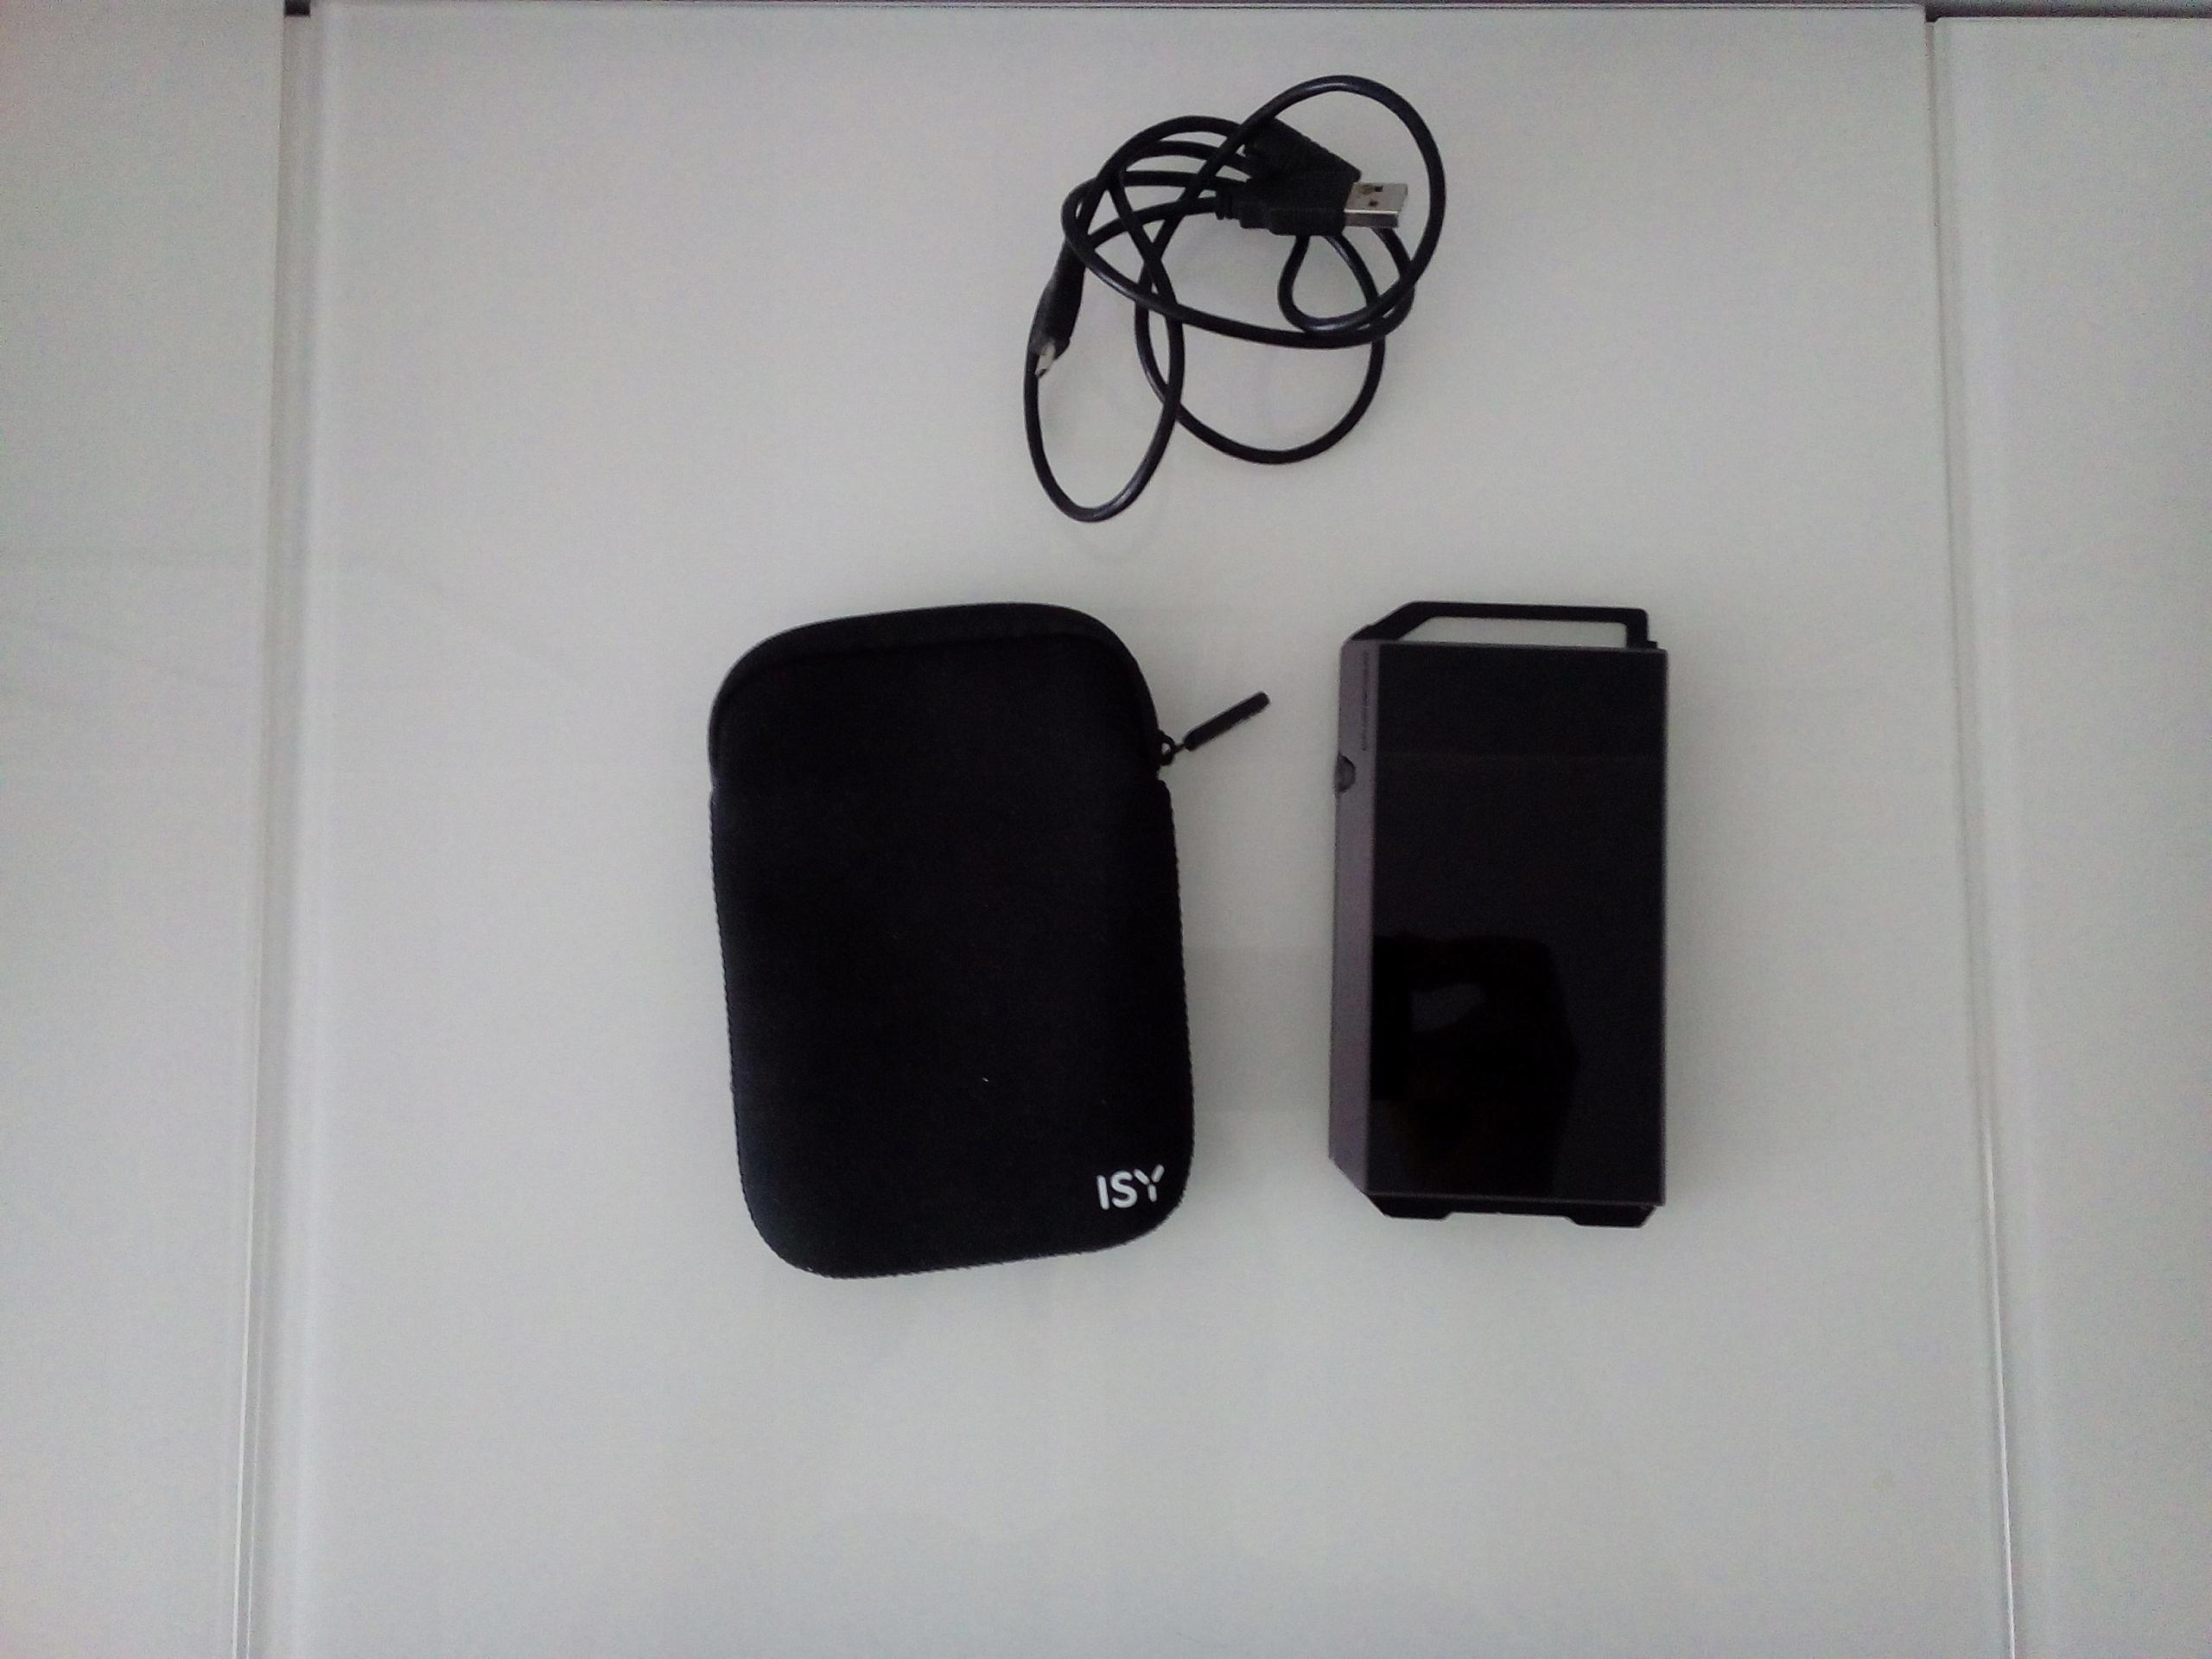 Odtwarzacz Pioneer XDP-100R 32GB HI-RES AUDIO